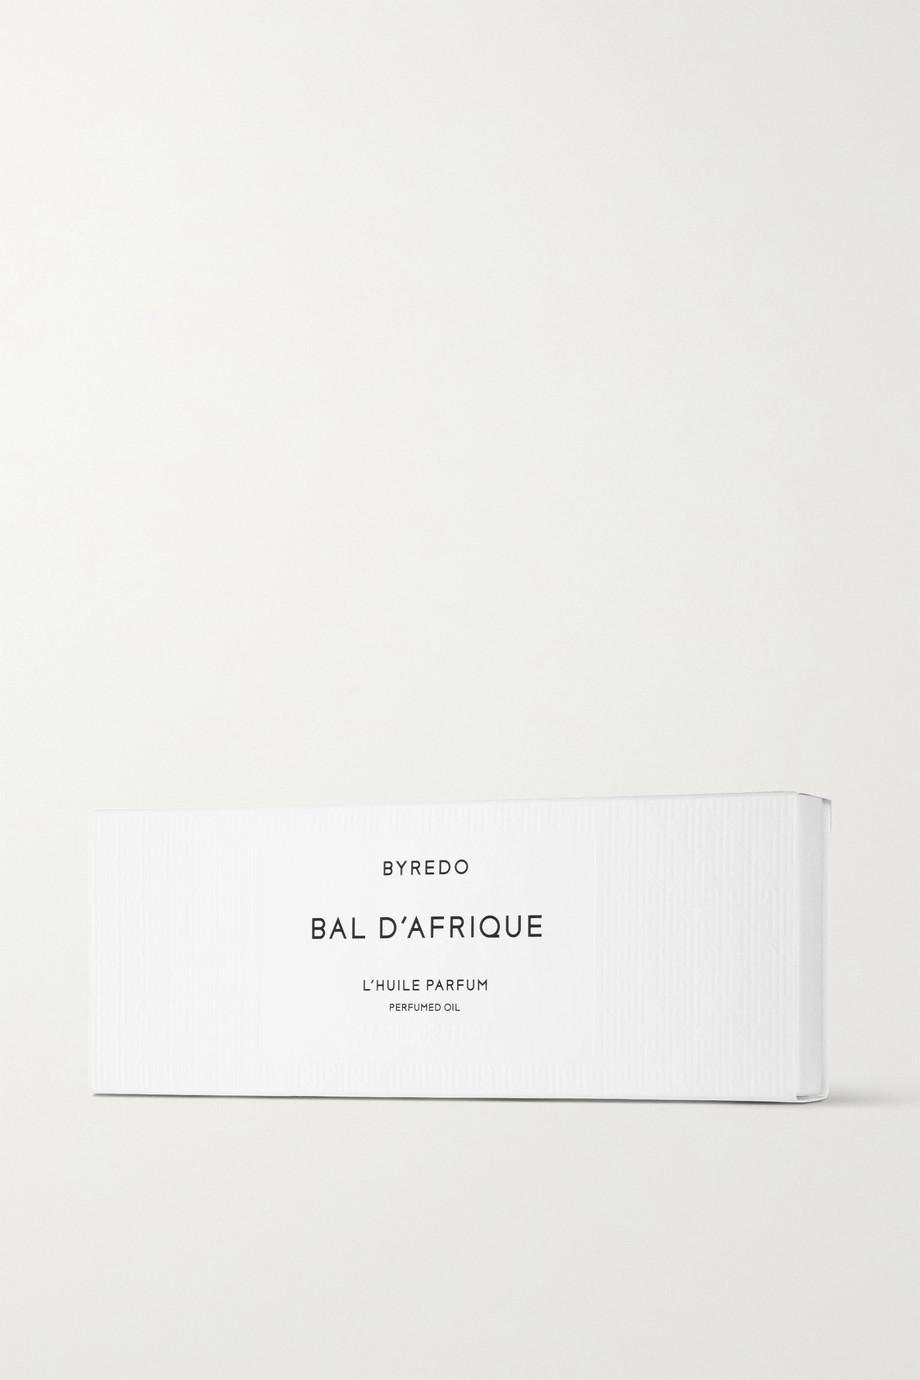 Byredo Perfumed Oil Roll-On - Bal d'Afrique, 7.5ml